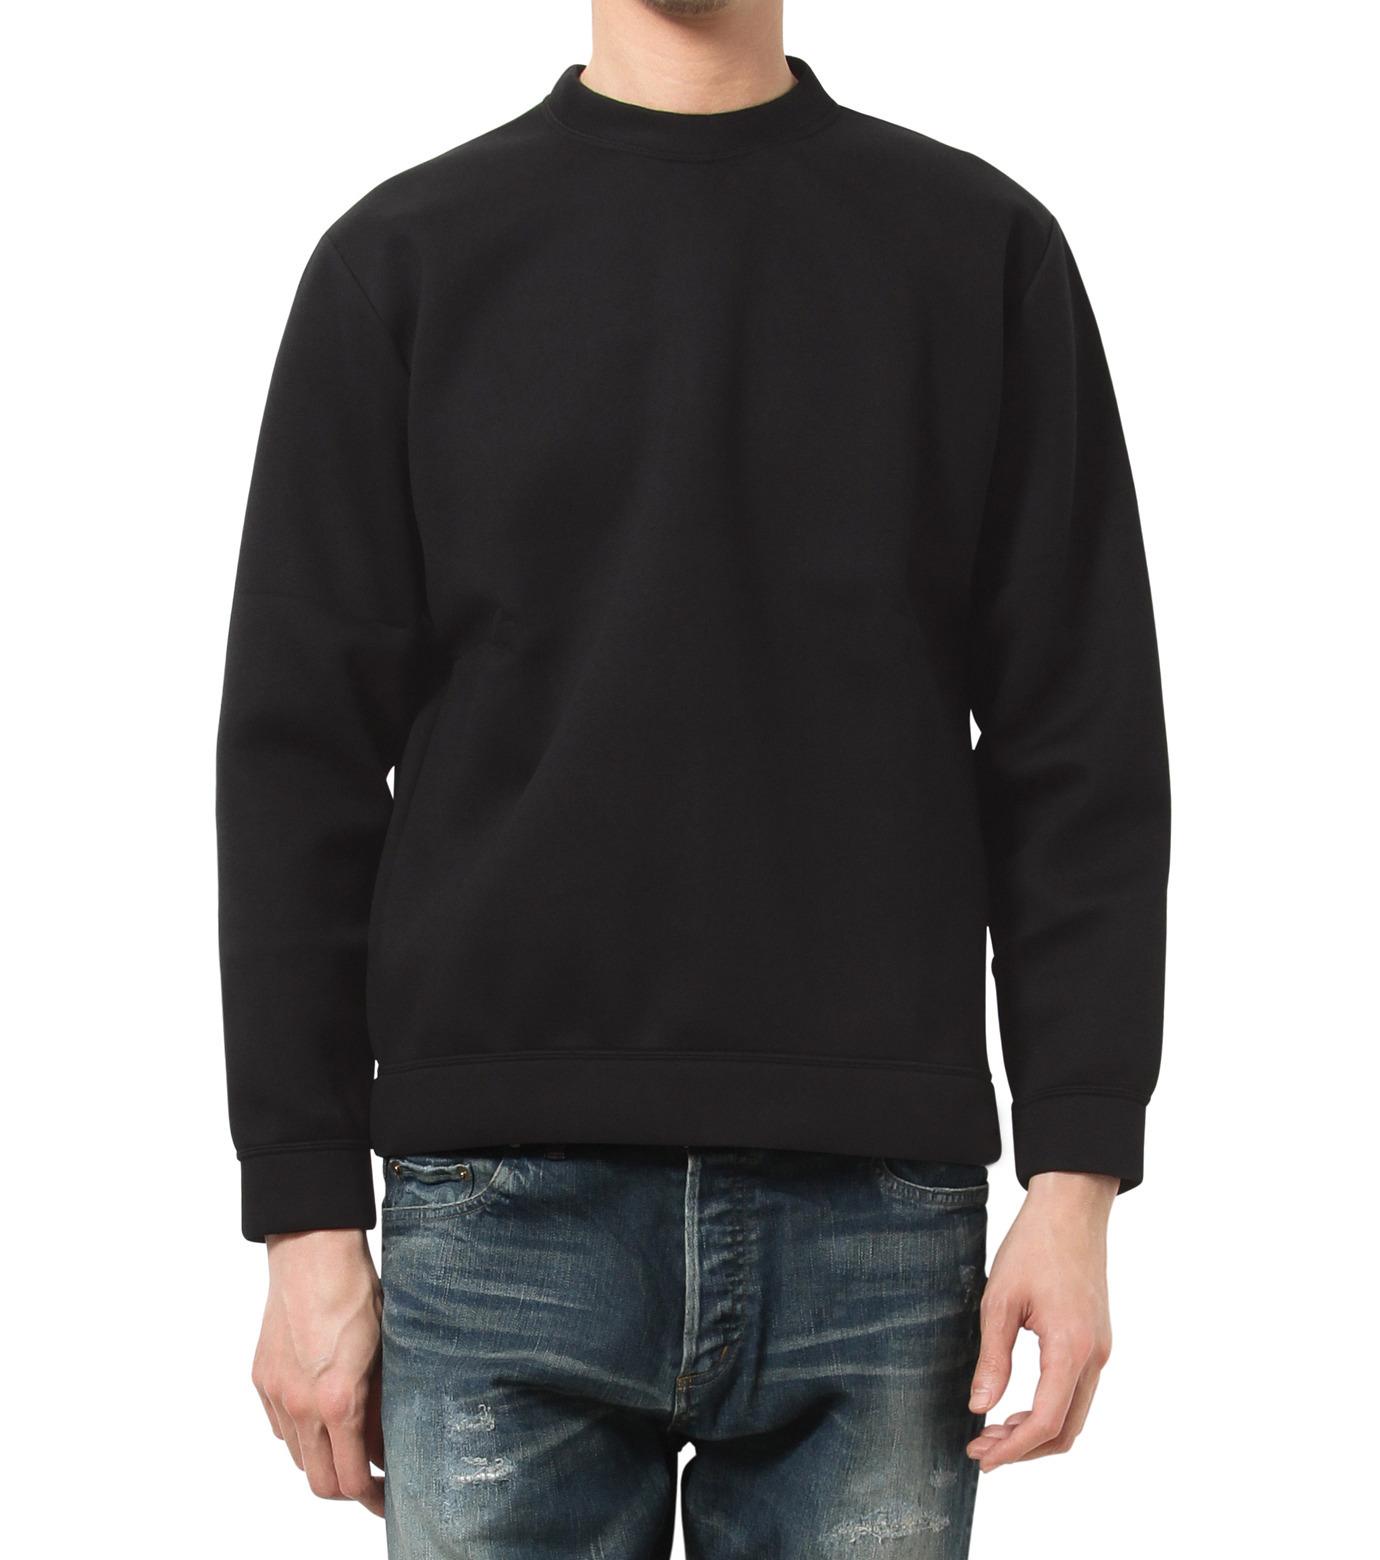 HL HEDDIE LOVU(エイチエル・エディールーヴ)のBONDING SWEATSHIRT-BLACK(カットソー/cut and sewn)-18S92001-13 拡大詳細画像1